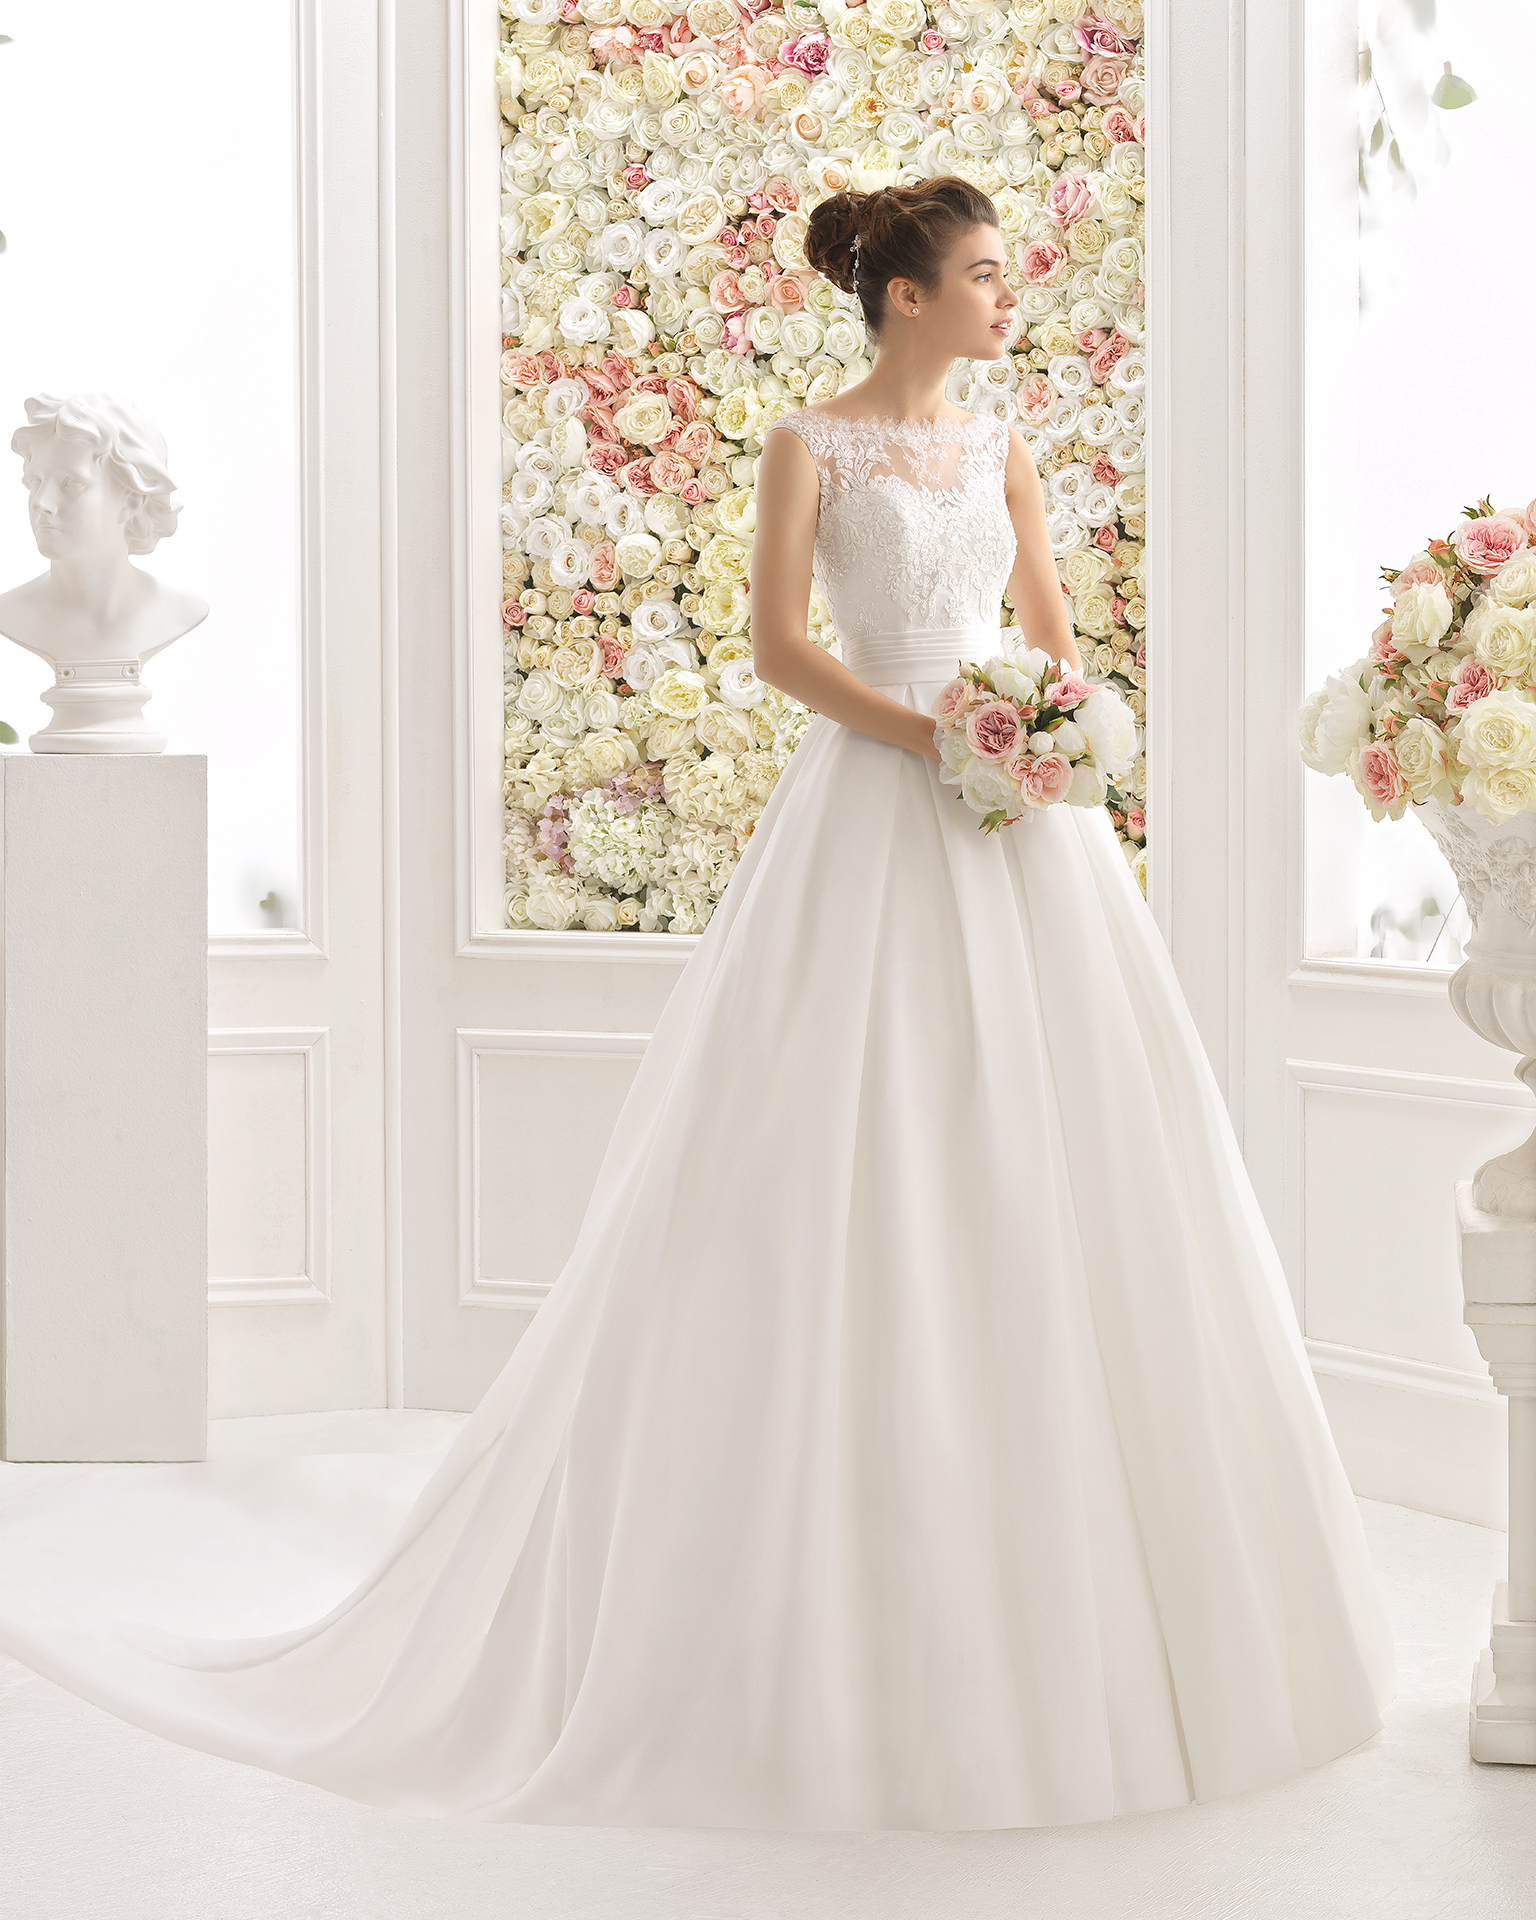 CELEBRE robe de mariée Aire Barcelona 2017